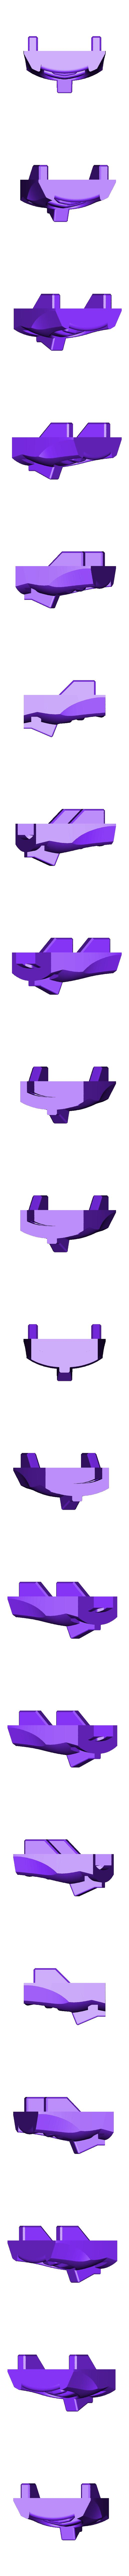 2_Brawn_Head2_Face_LIGHTGREY.stl Download free STL file G1 Transformers Brawn • 3D printer object, Toymakr3D